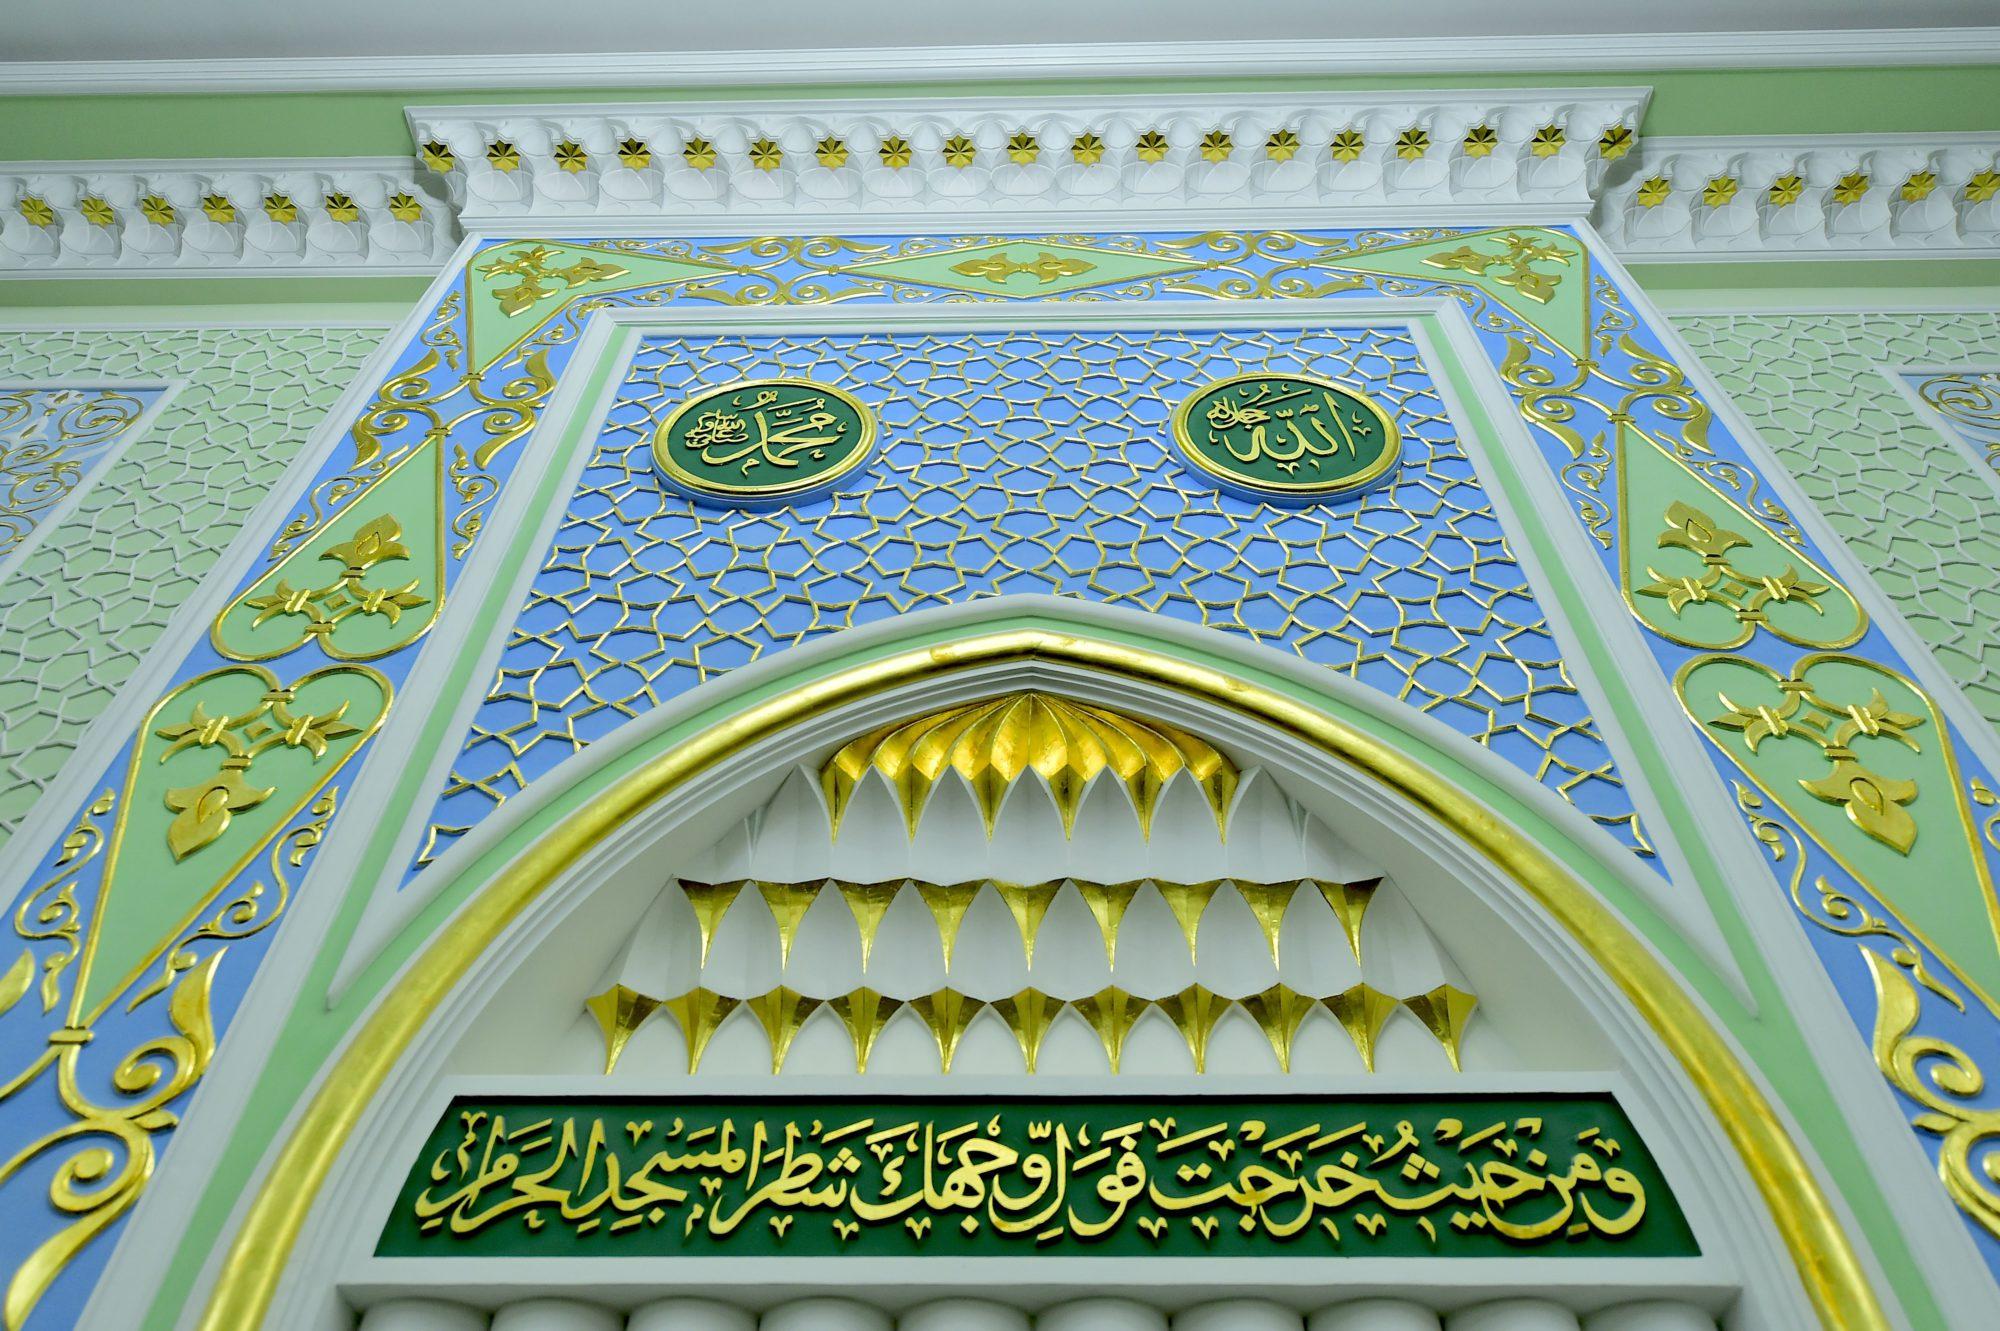 Абдул Хамид Қаттани © Мақсат Шағырбаев